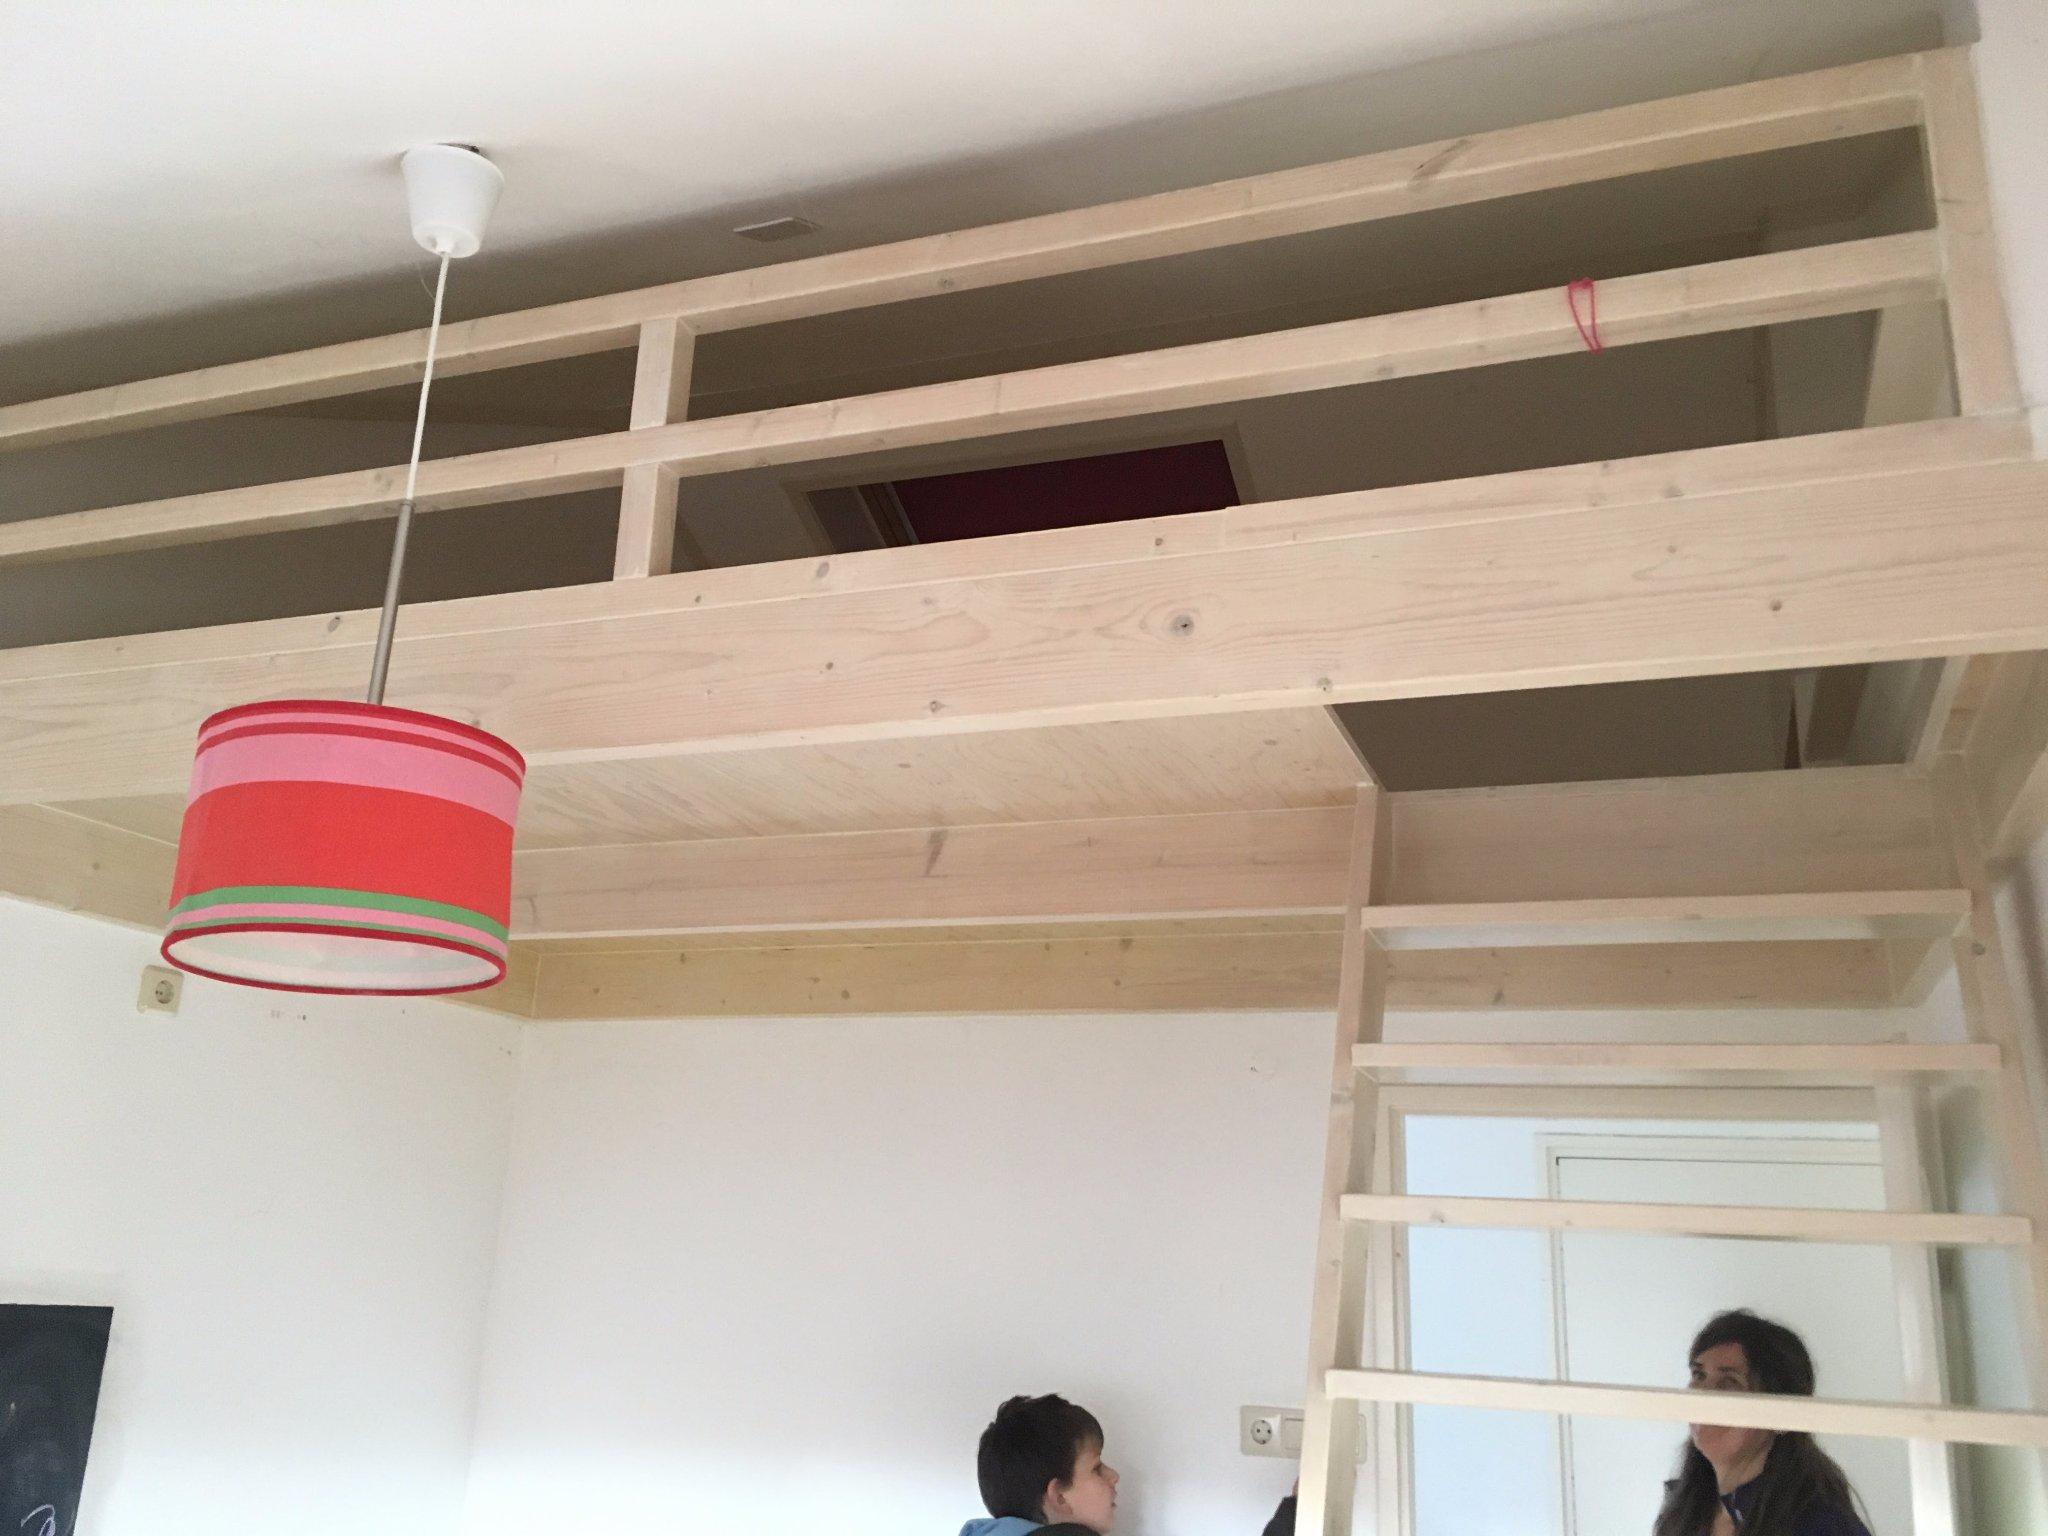 Entresol maken op slaapkamer - Werkspot